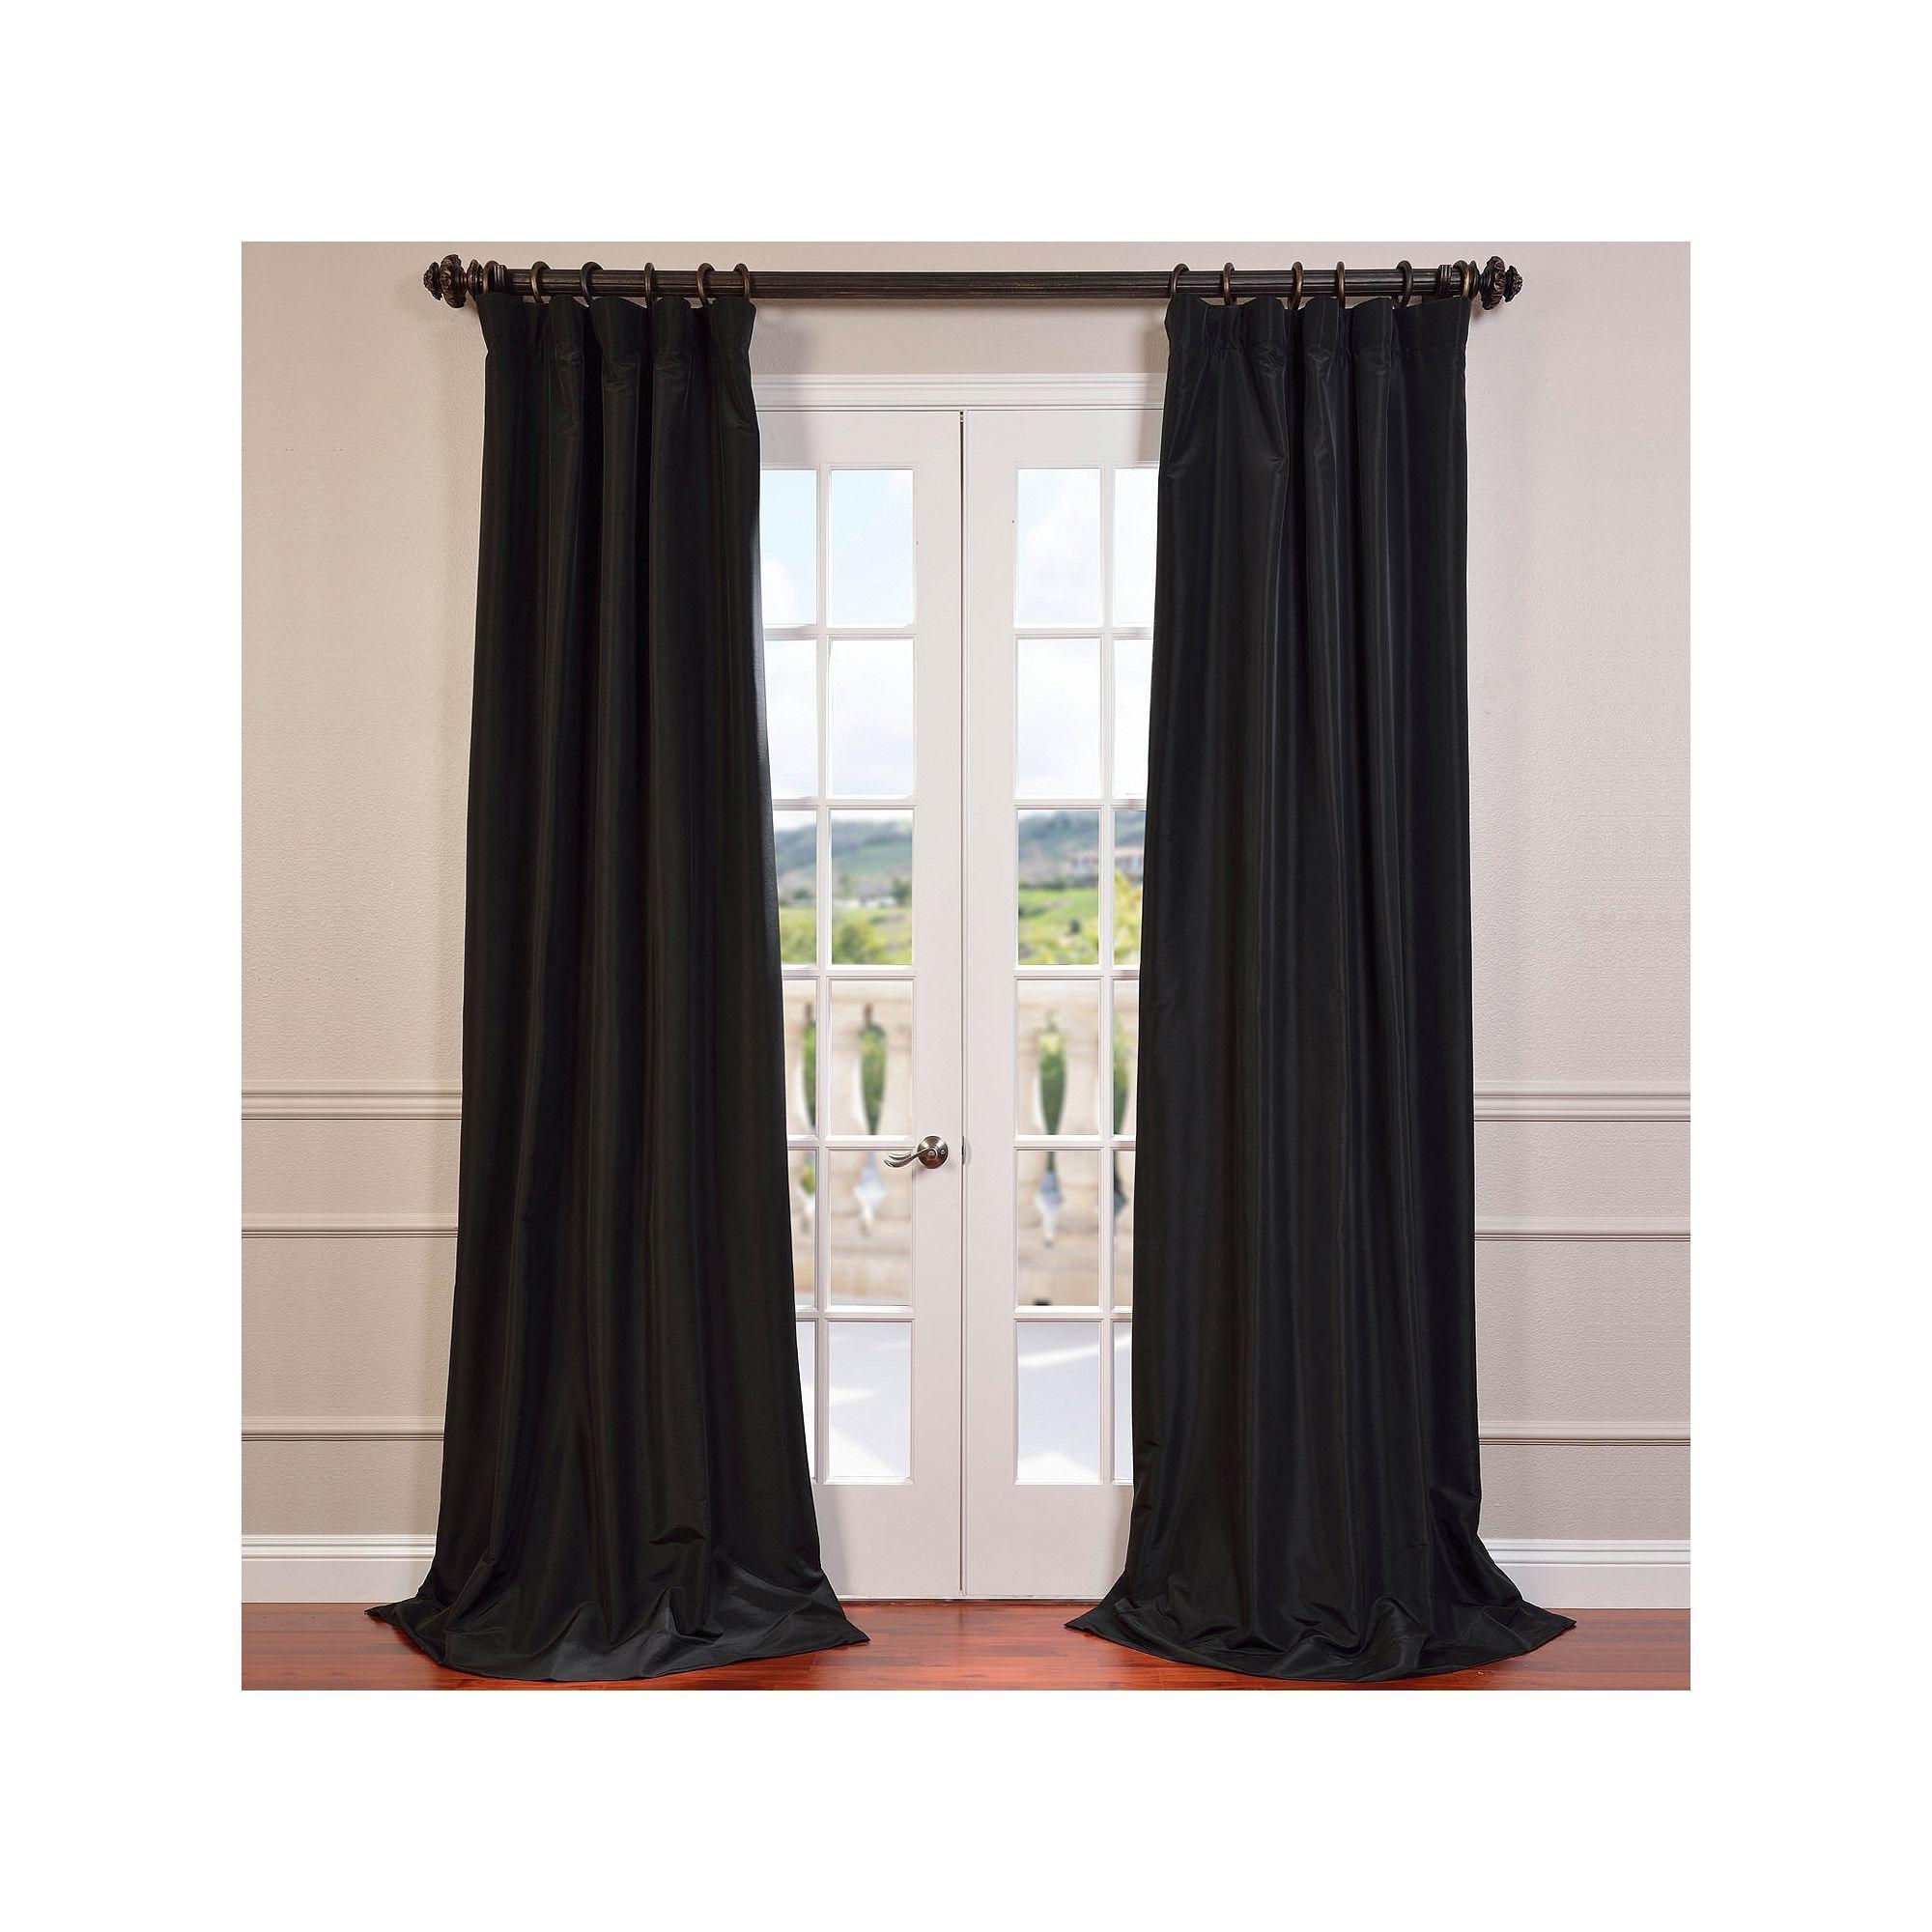 Favorite Warm Black Velvet Single Blackout Curtain Panels Pertaining To Eff Blackout 1 Panel Faux Silk Taffeta Window Curtain (View 12 of 20)